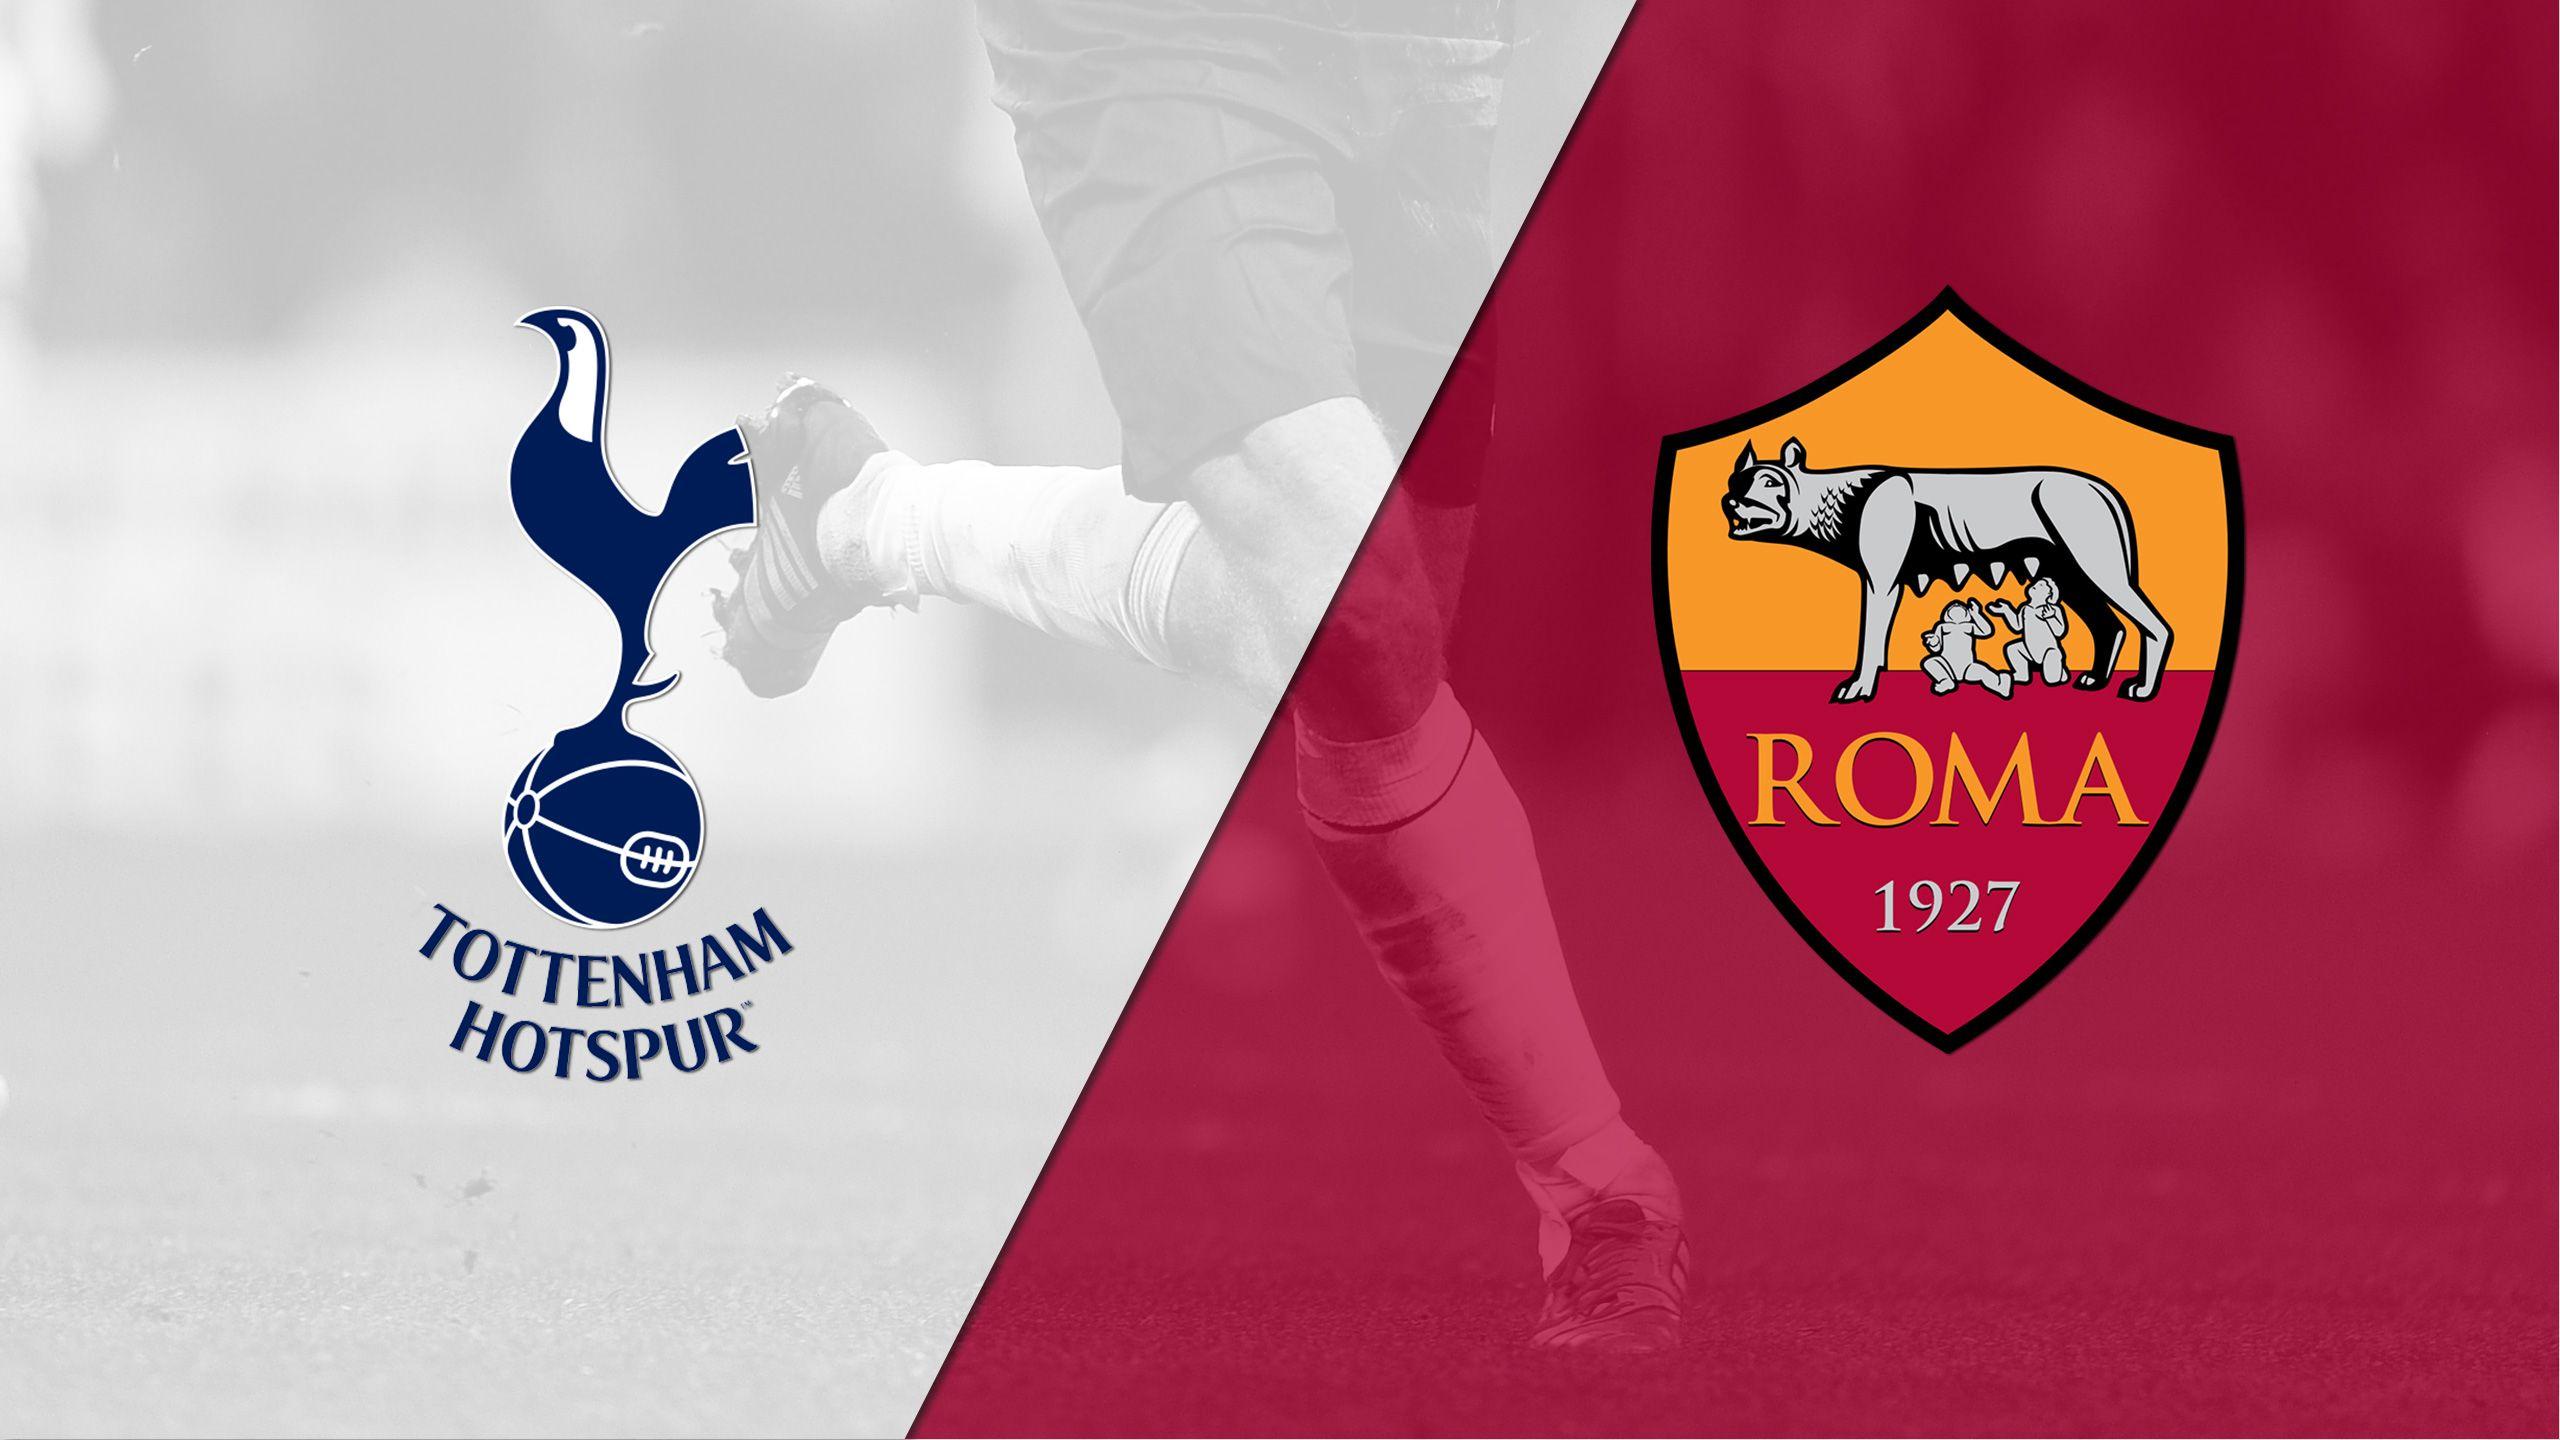 Tottenham Hotspur vs. AS Roma (International Champions Cup)